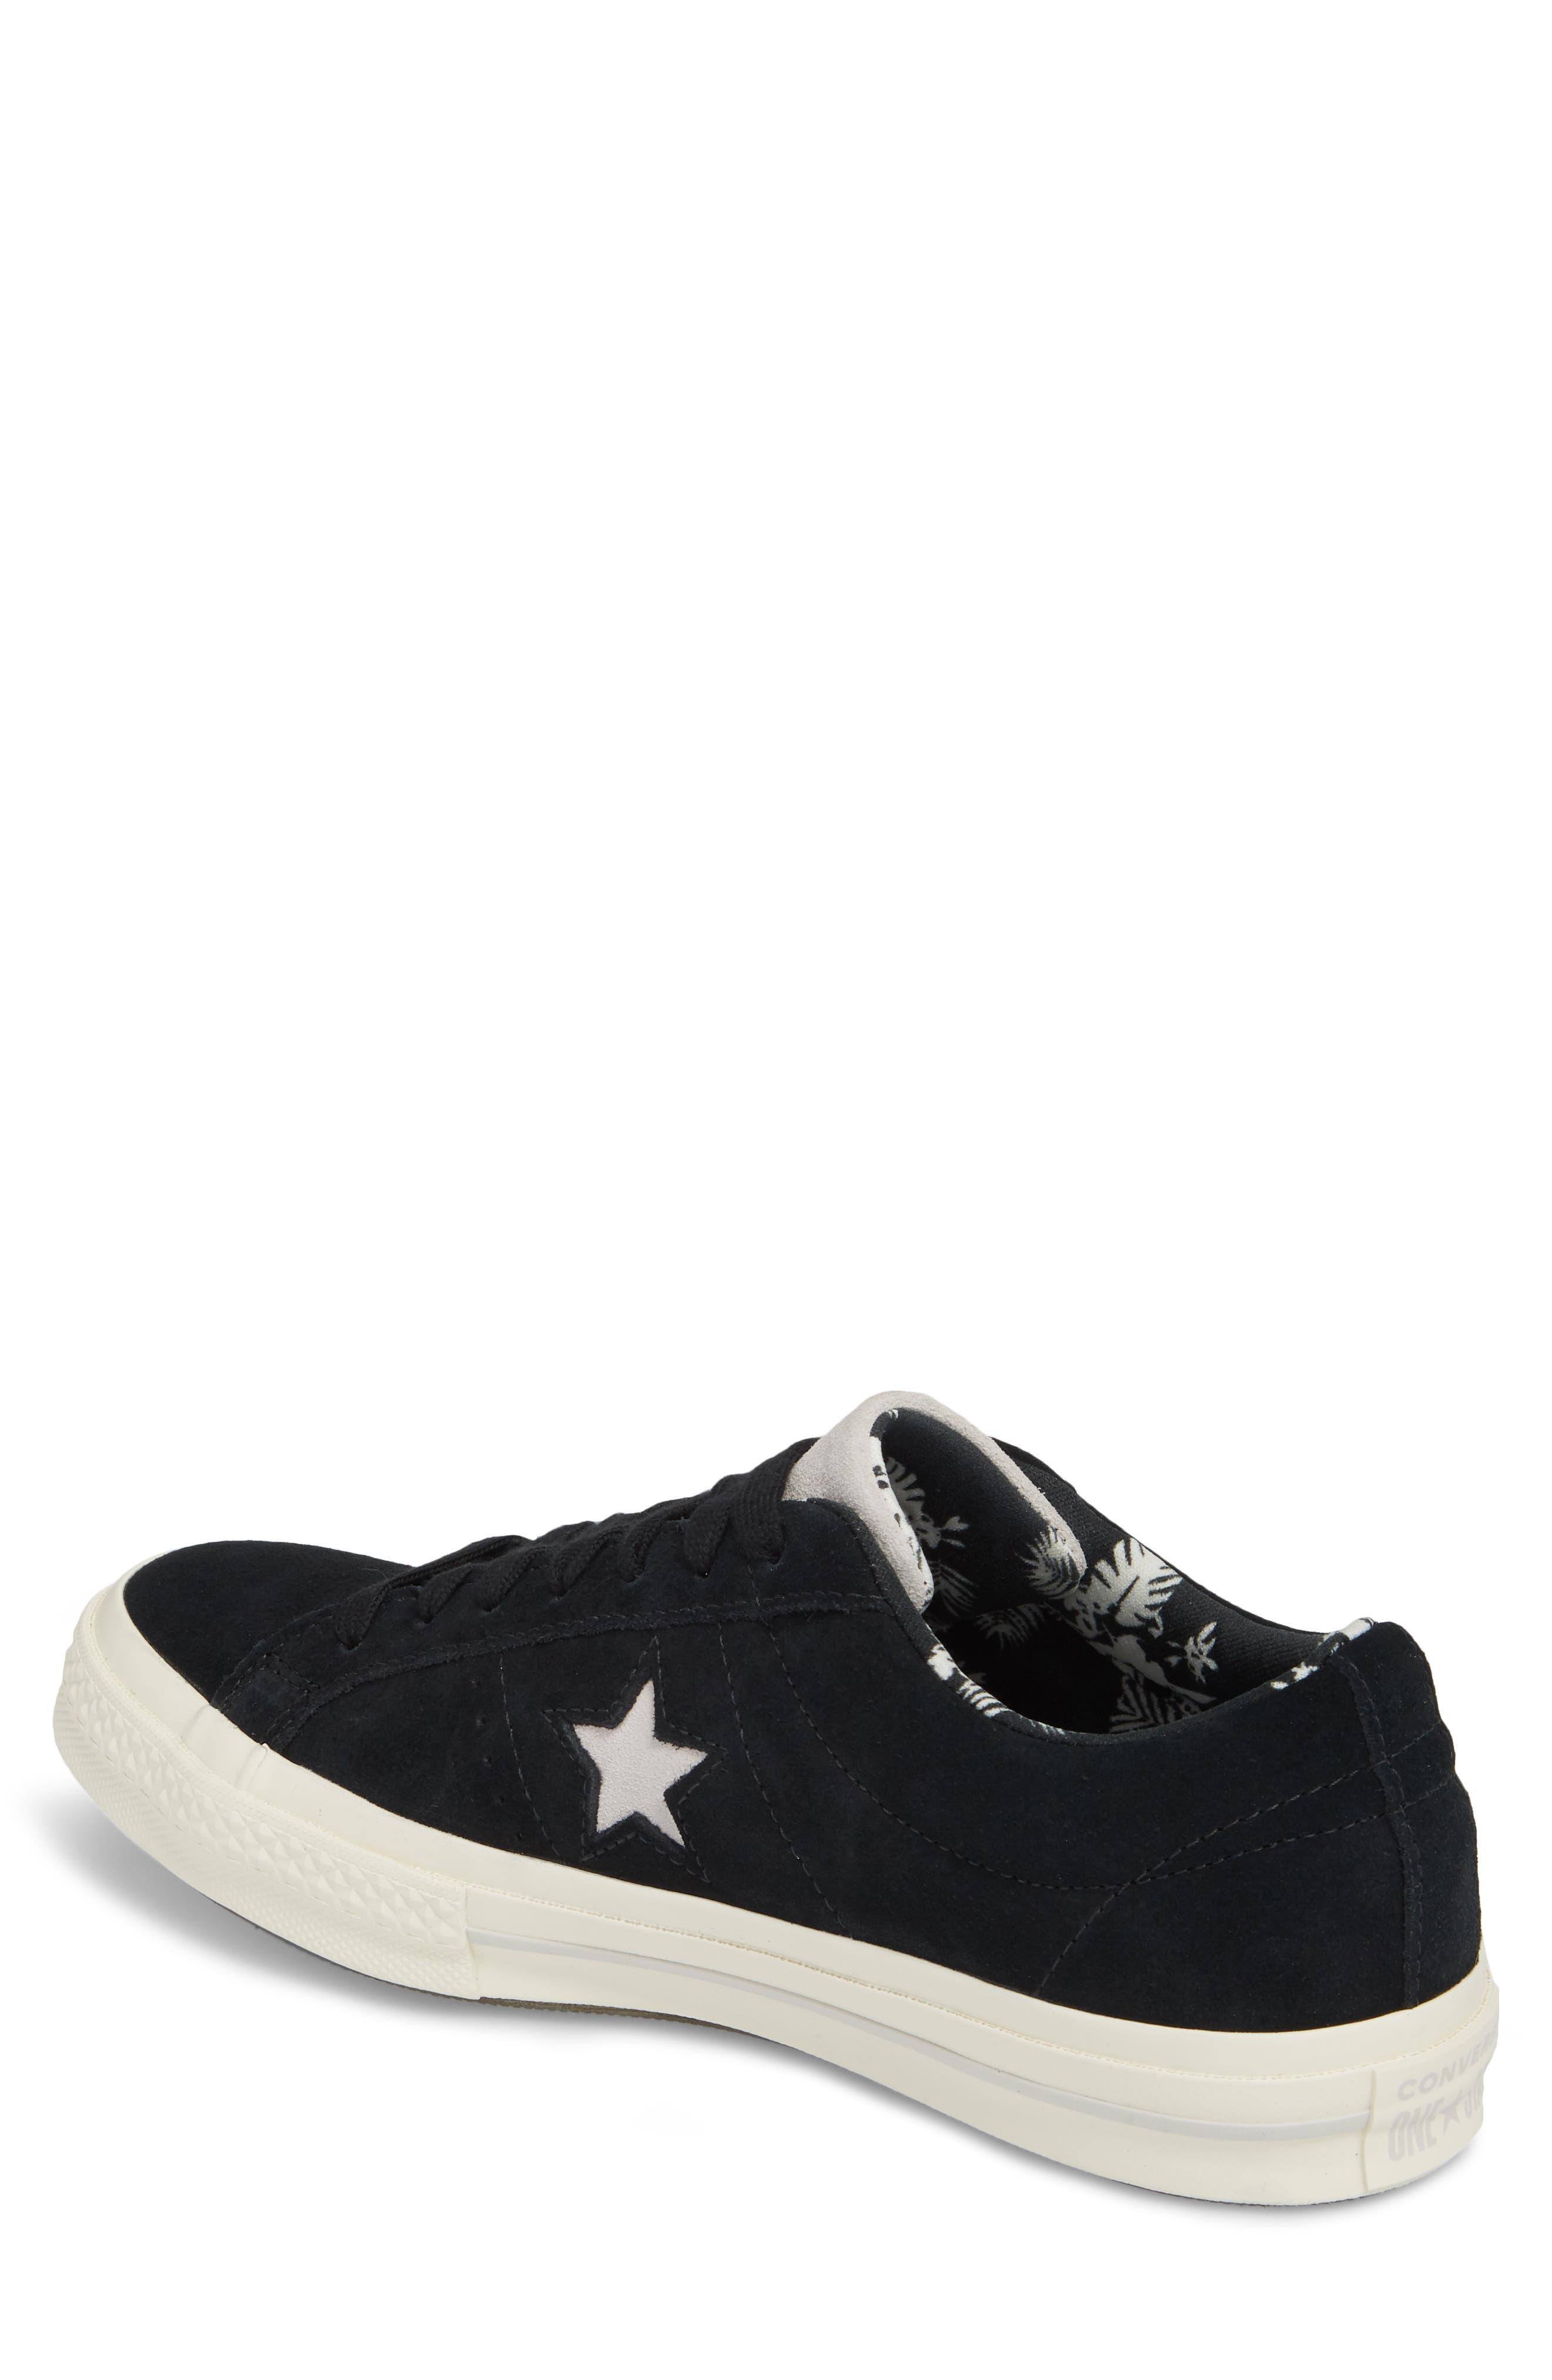 One-Star Tropical Sneaker,                             Alternate thumbnail 2, color,                             001